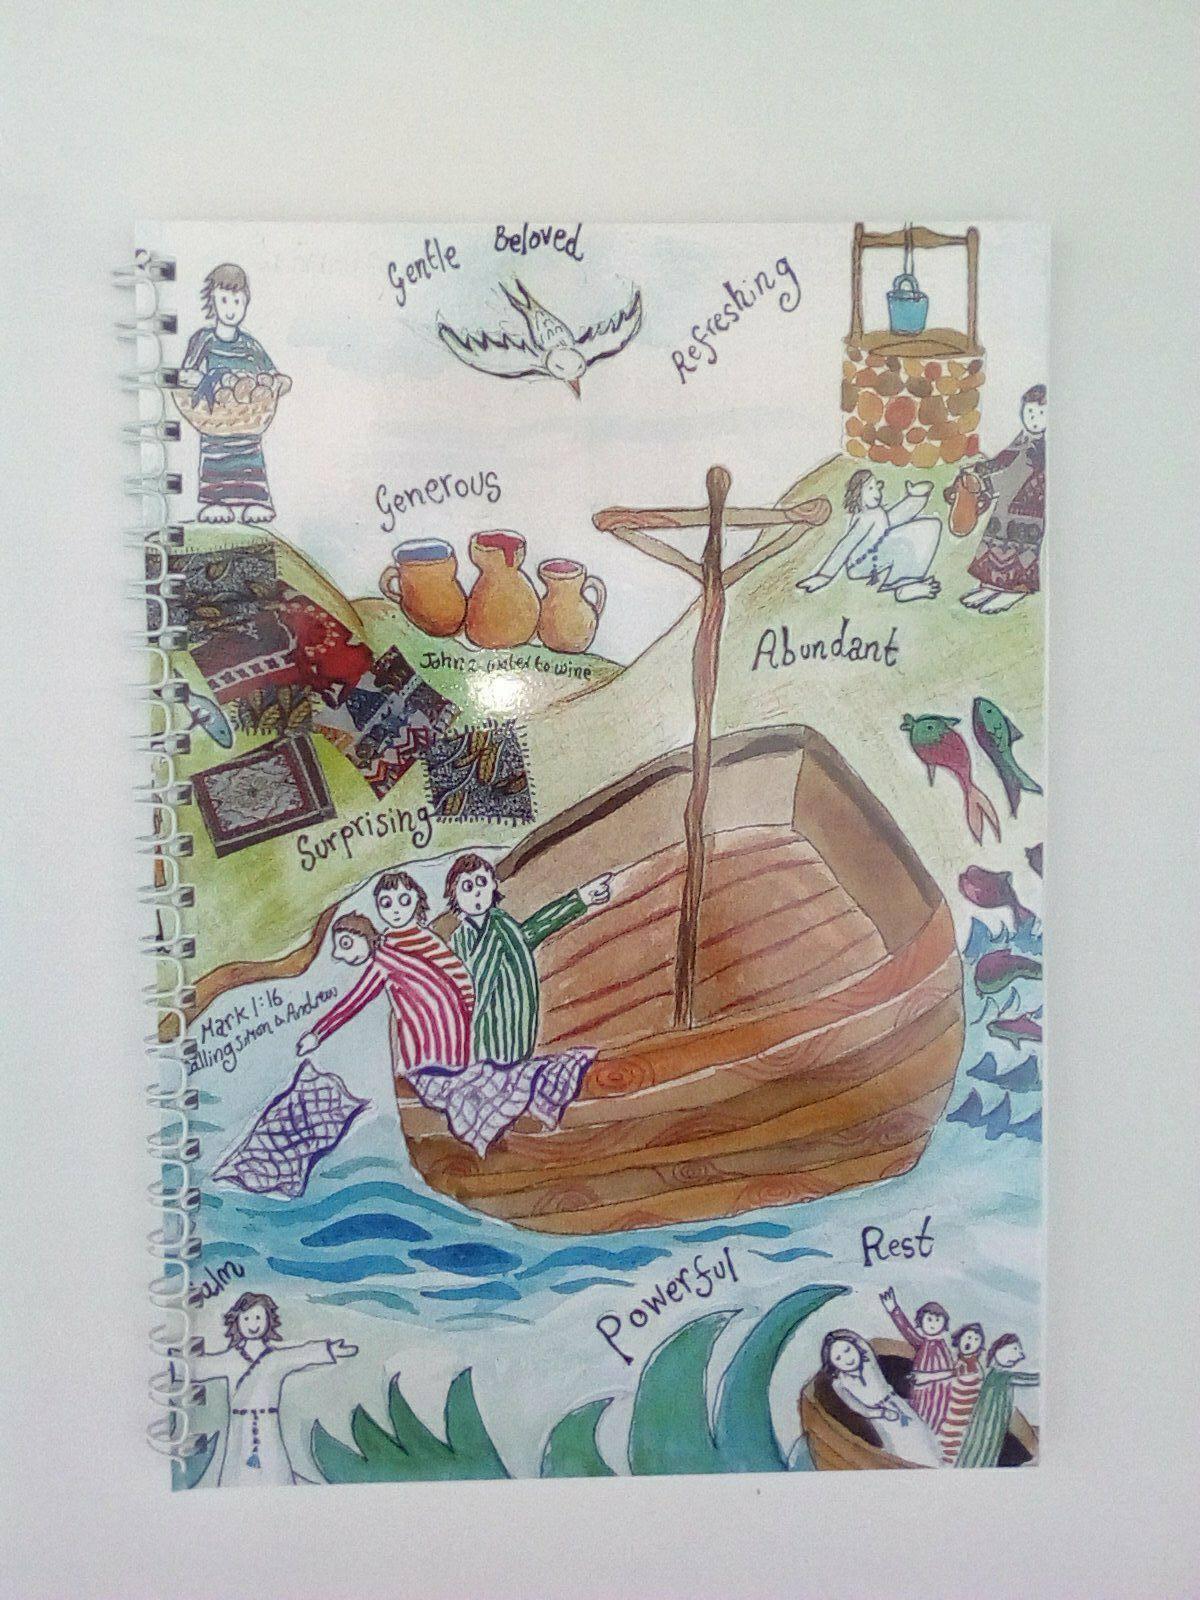 'Sea of Galilee' Notebook